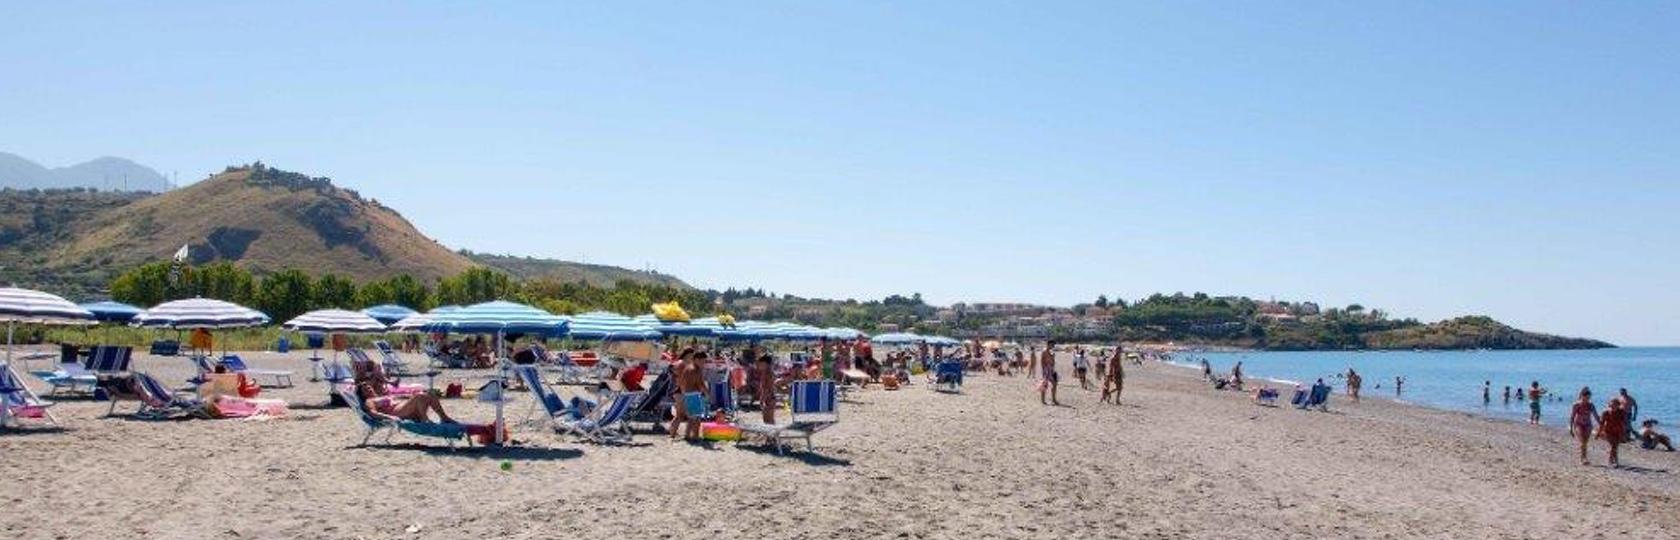 holidaybeach_spiaggia.jpg